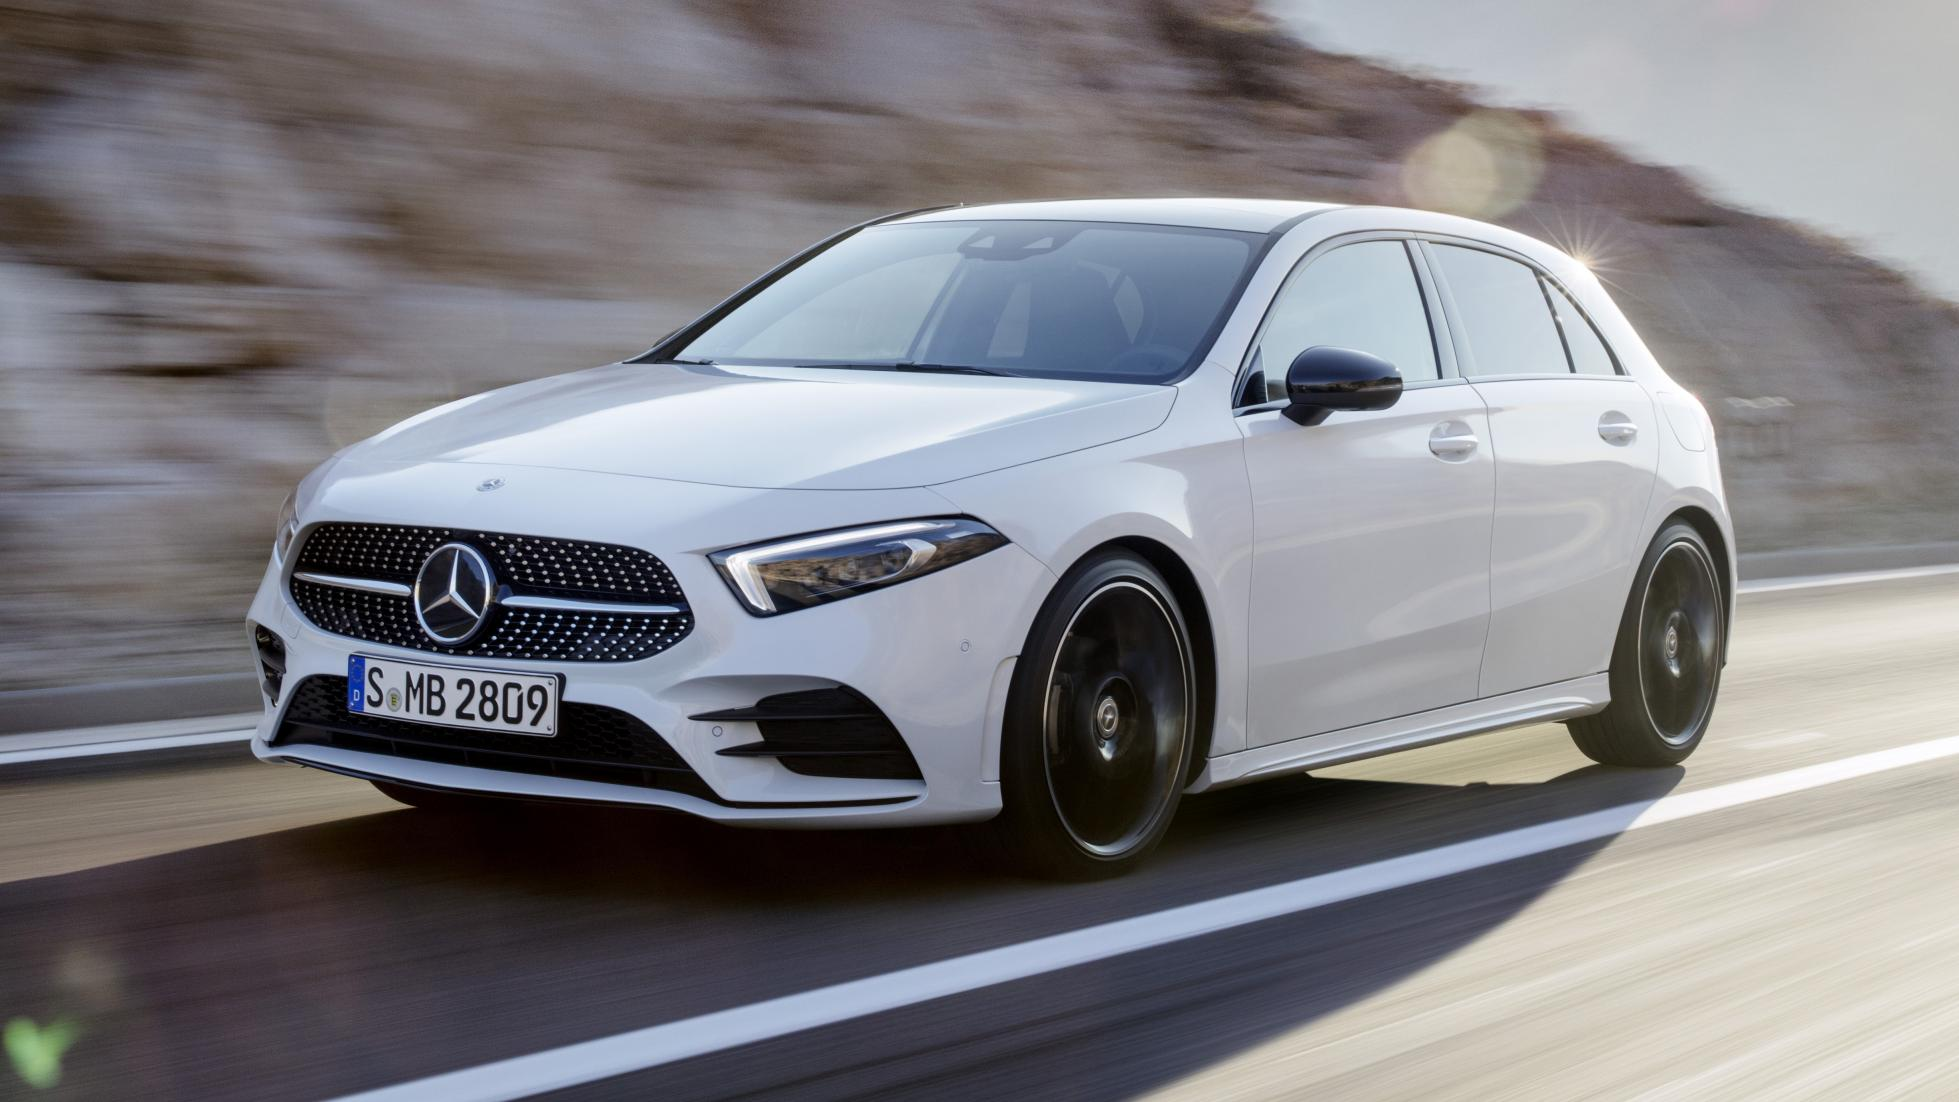 Mercedes A Klasse Prijs Is Bekend Topgear Nederland